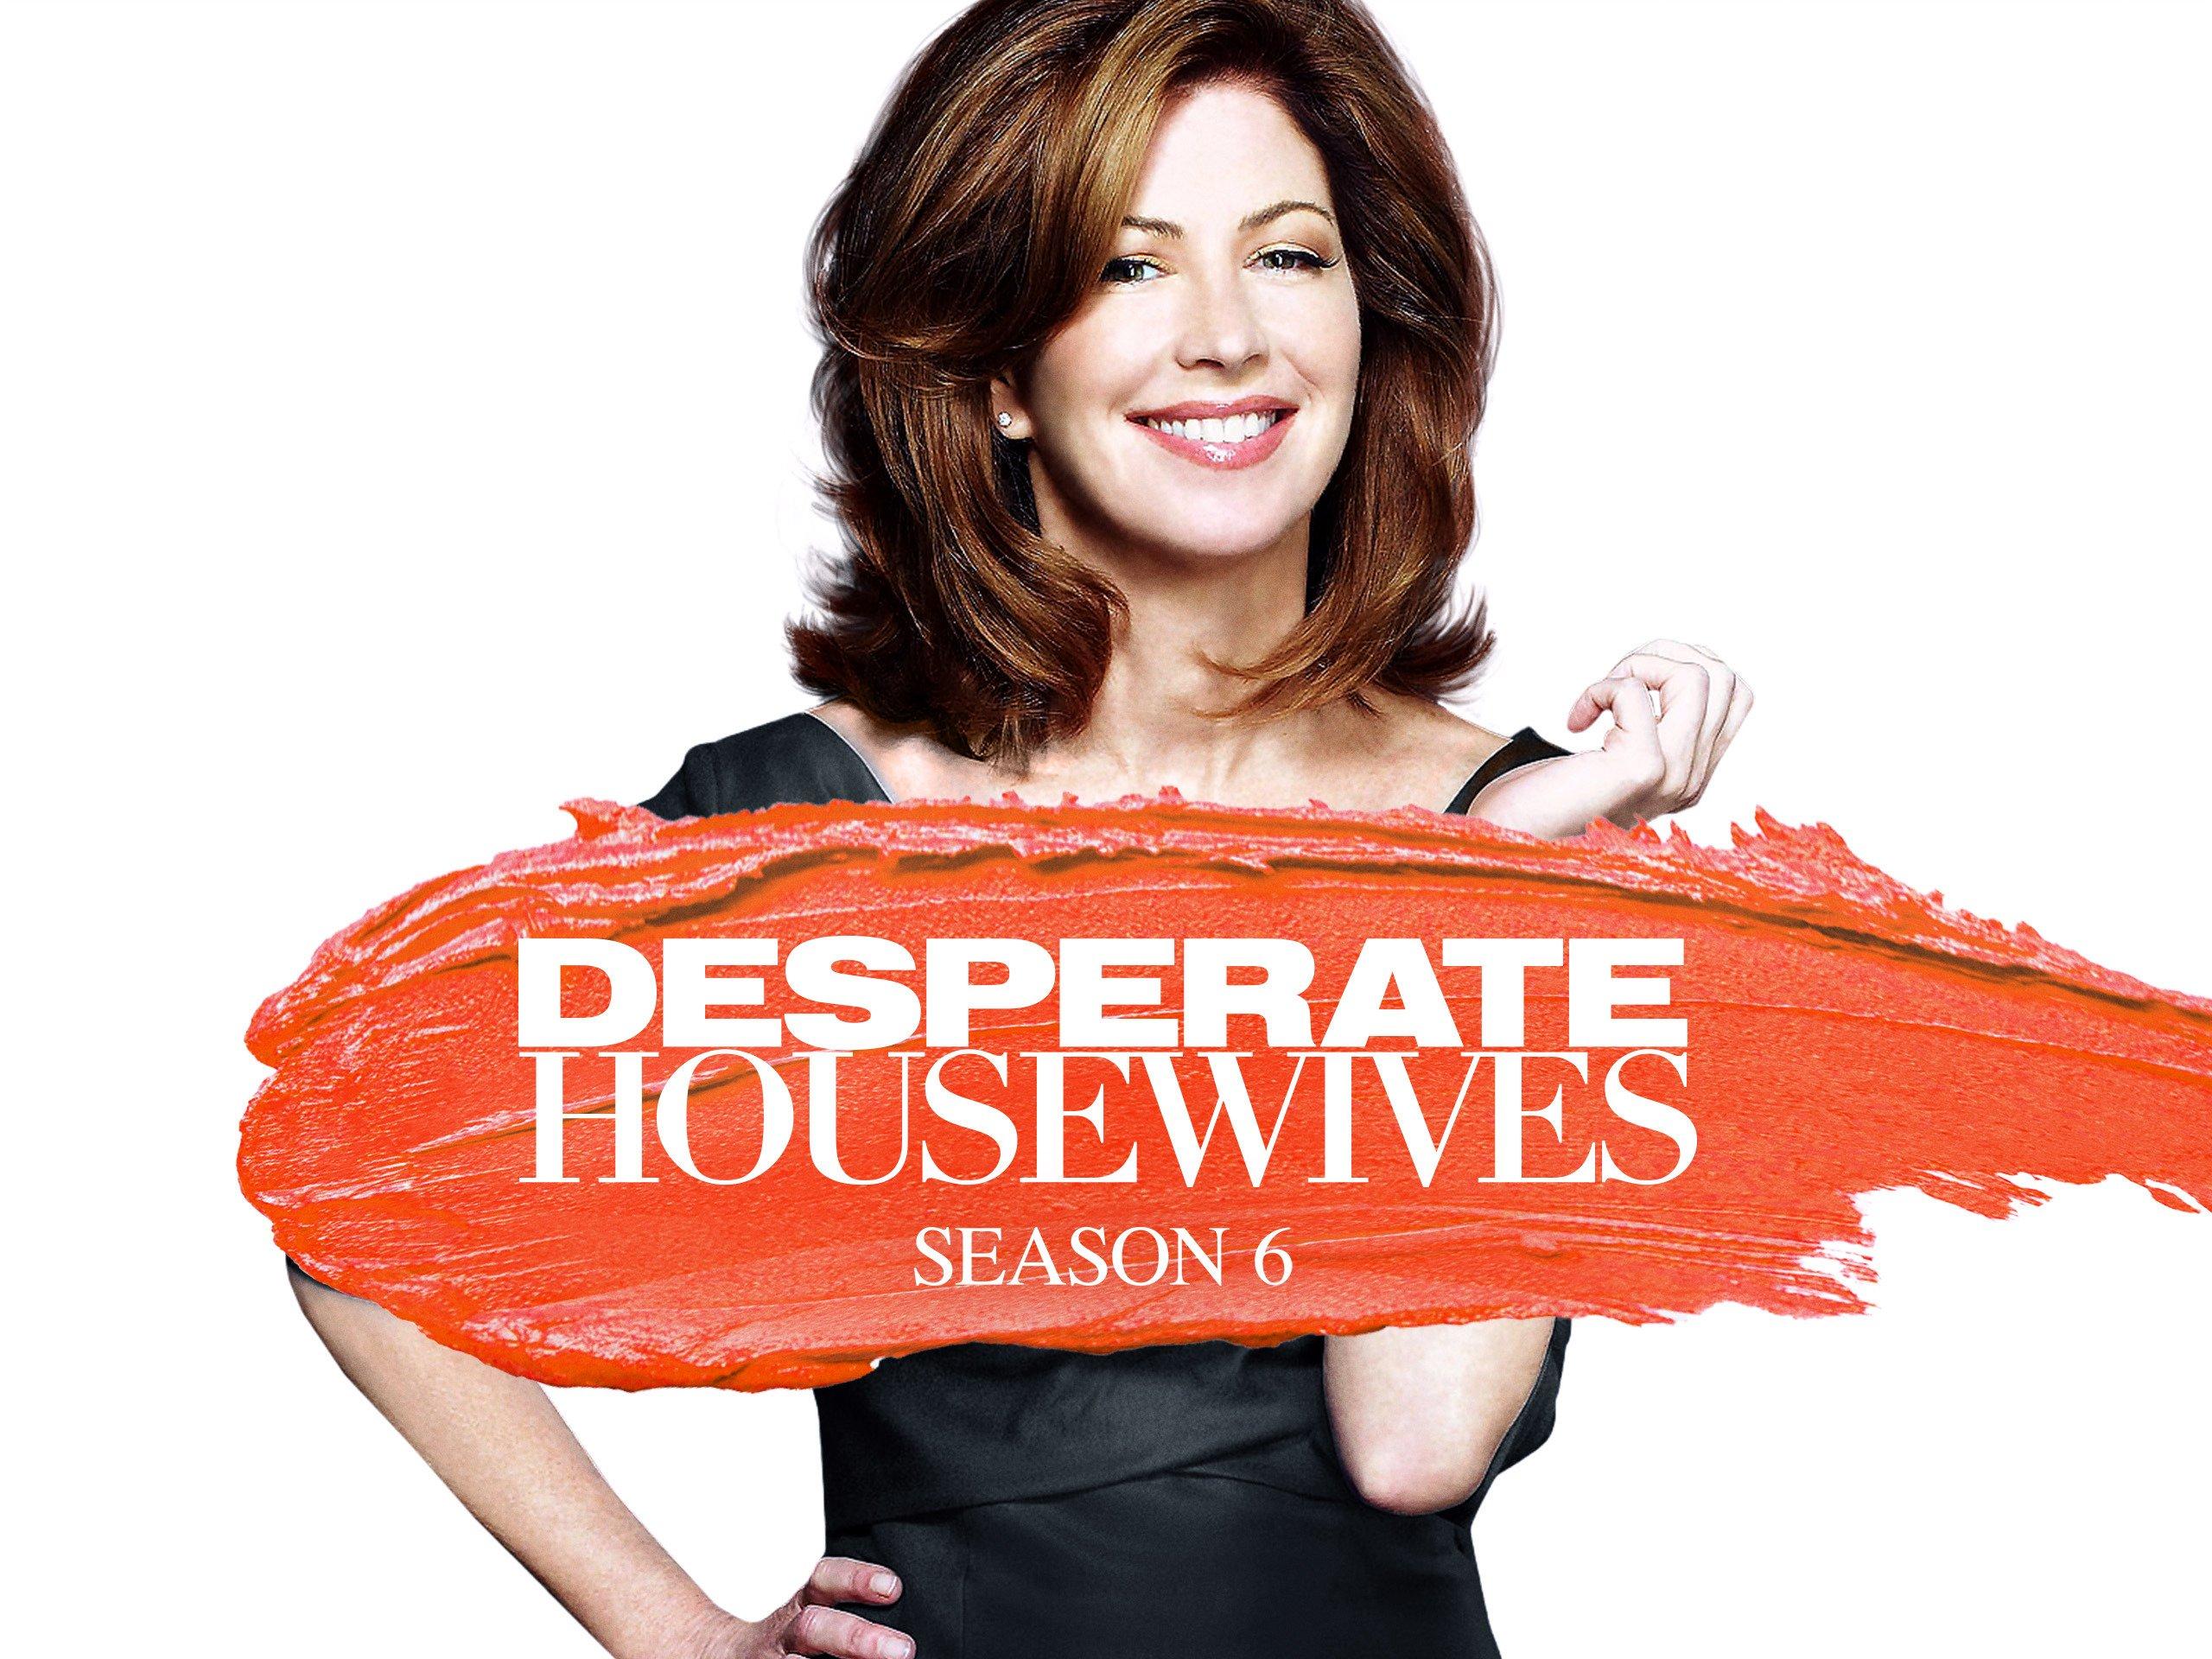 putlocker desperate housewives season 1 episode 9